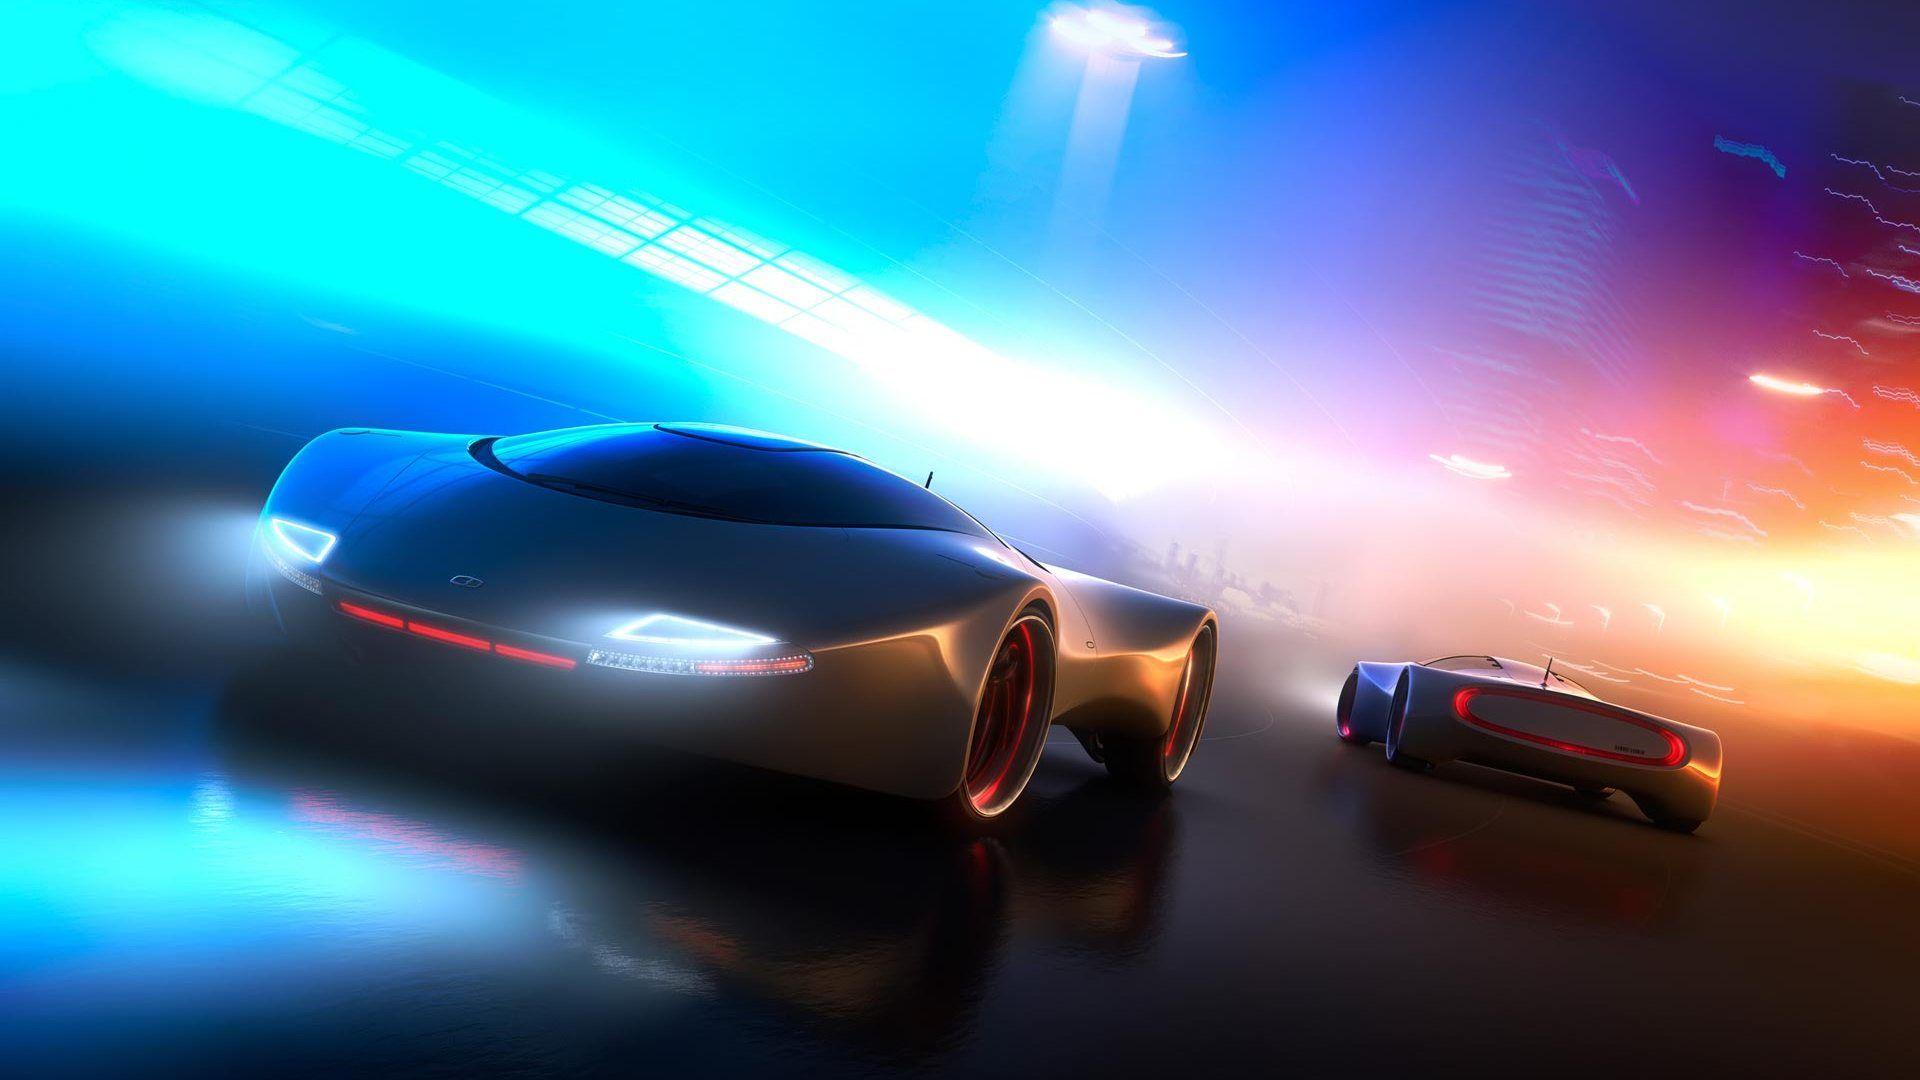 Www Best Desktop Wallpapers Com 2020 Live Wallpaper Hd Concept Cars Car Wallpapers Futuristic Cars